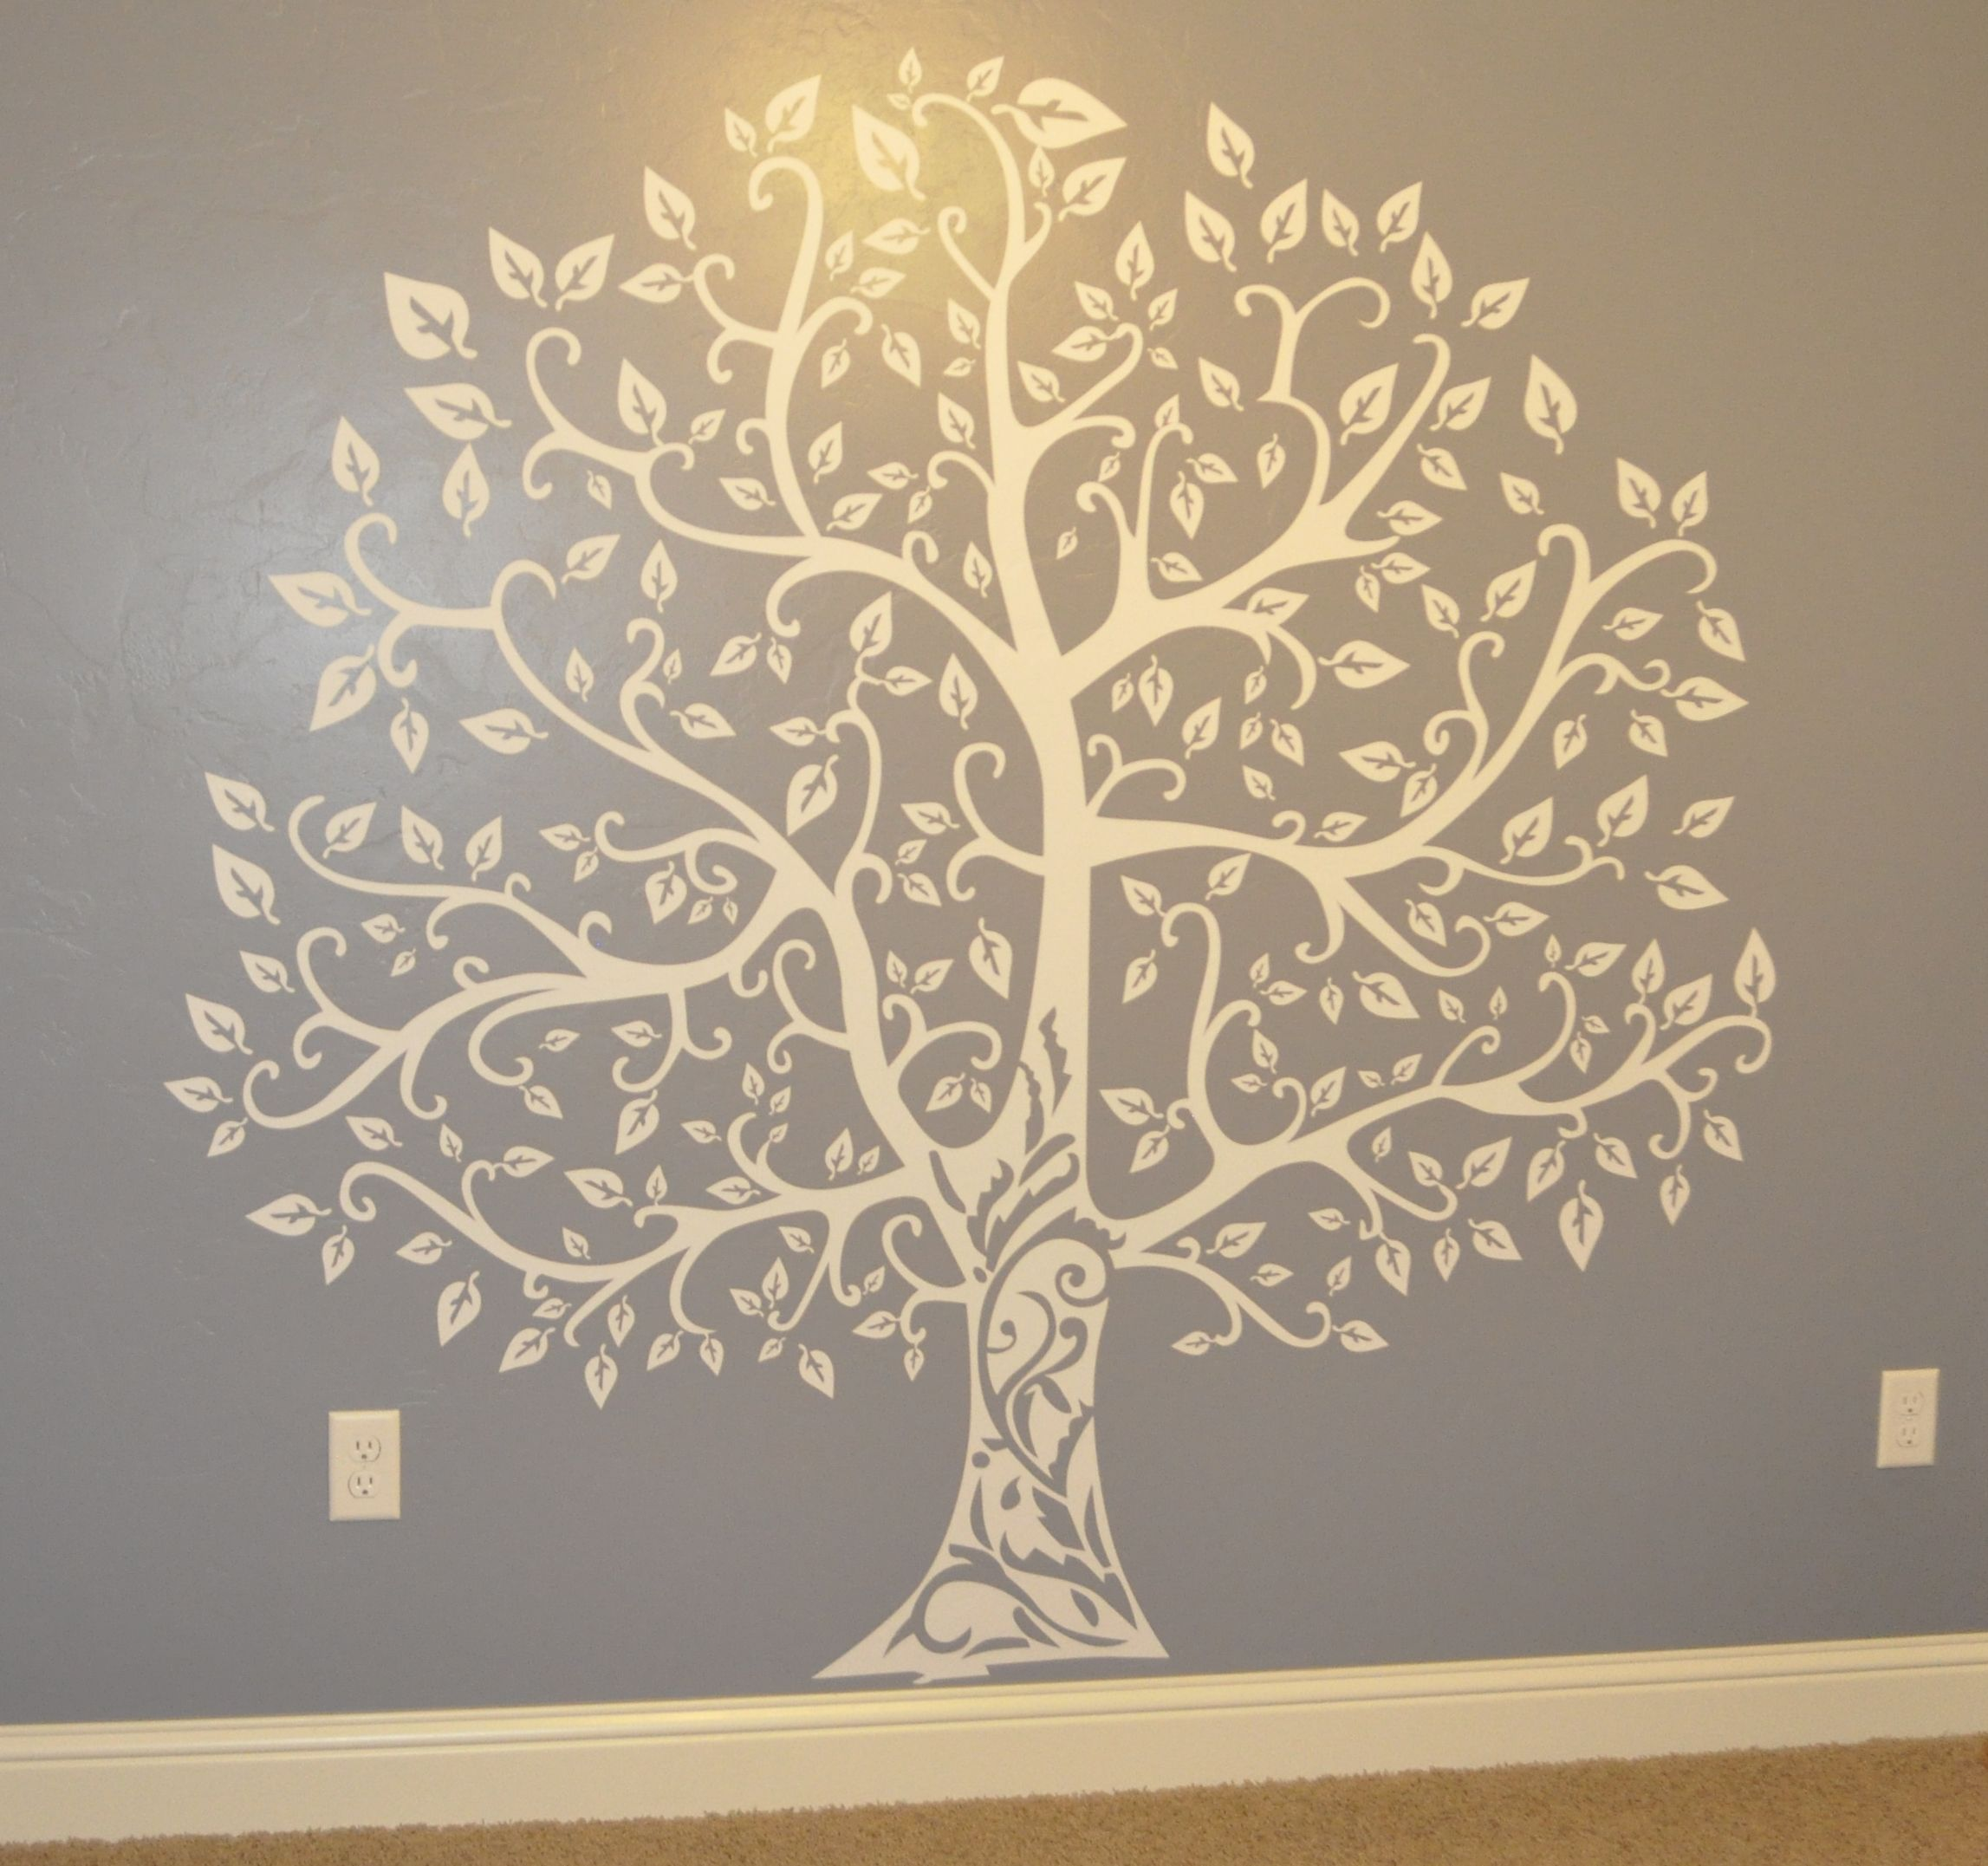 Banyan/Celtic Tree wall decal for nursery wall.   Markos or ...